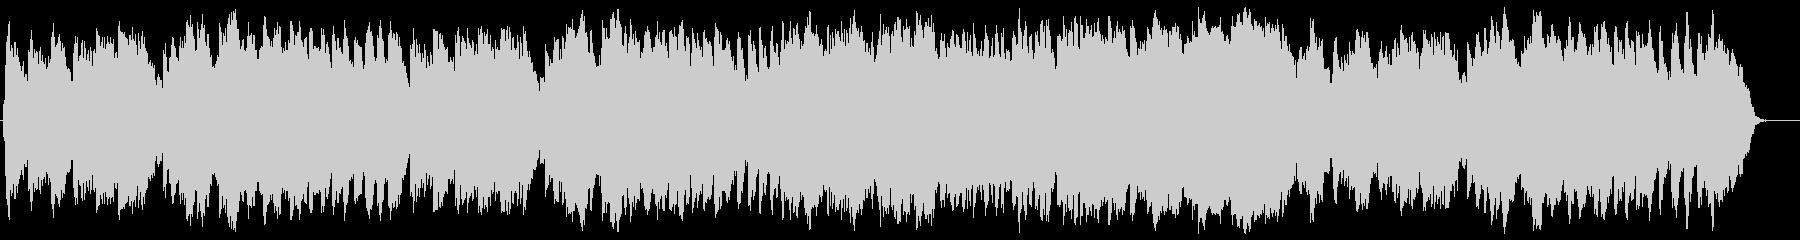 Figaro's Marriage (Mozart)'s unreproduced waveform